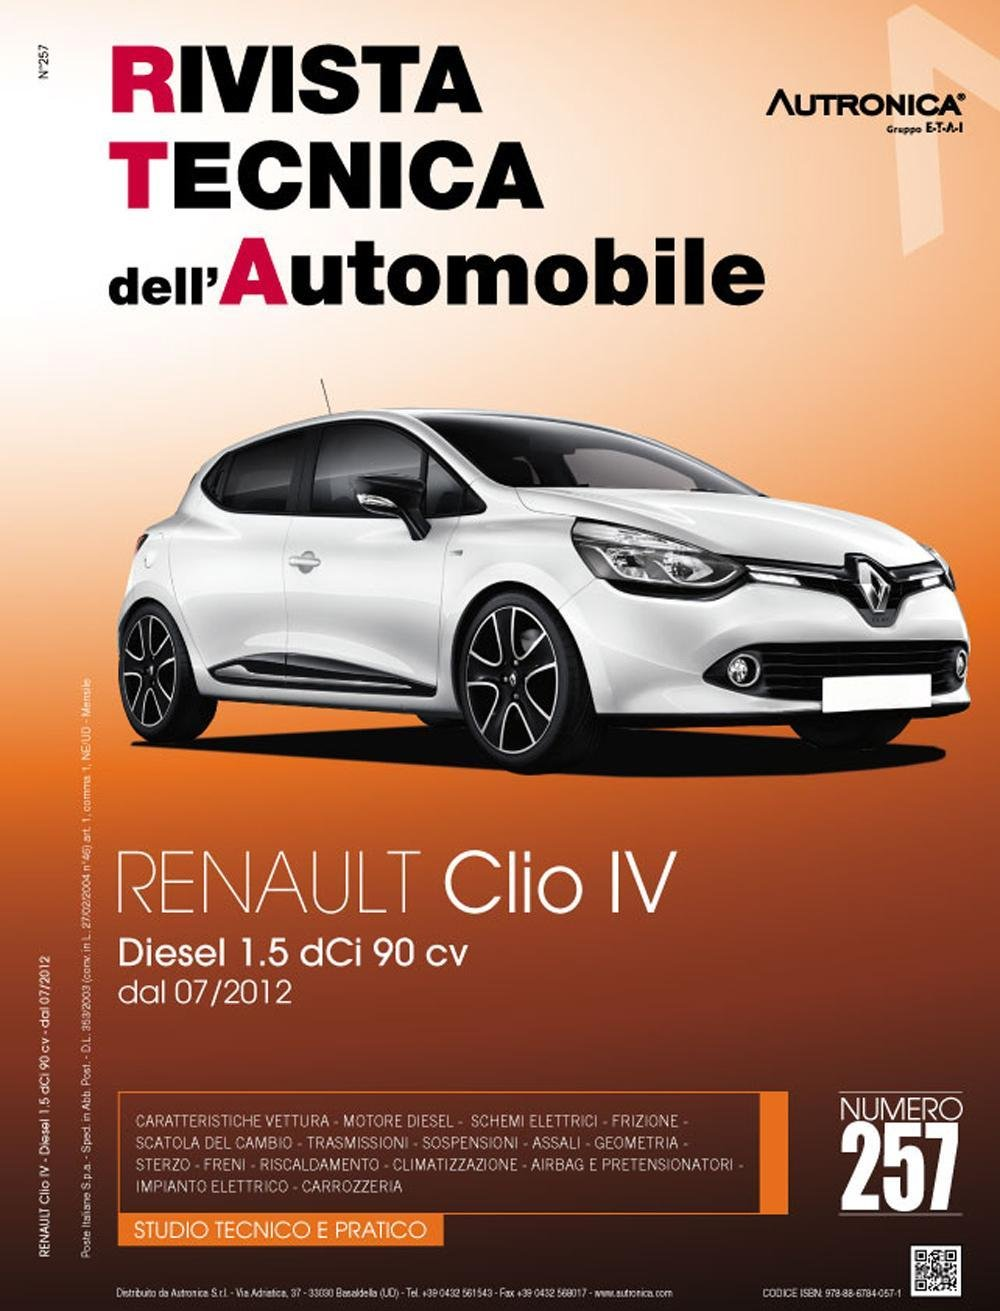 Schemi Elettrici Renault : Amazon.it: renault clio iv. diesel 1.5 dci 90 cv libri